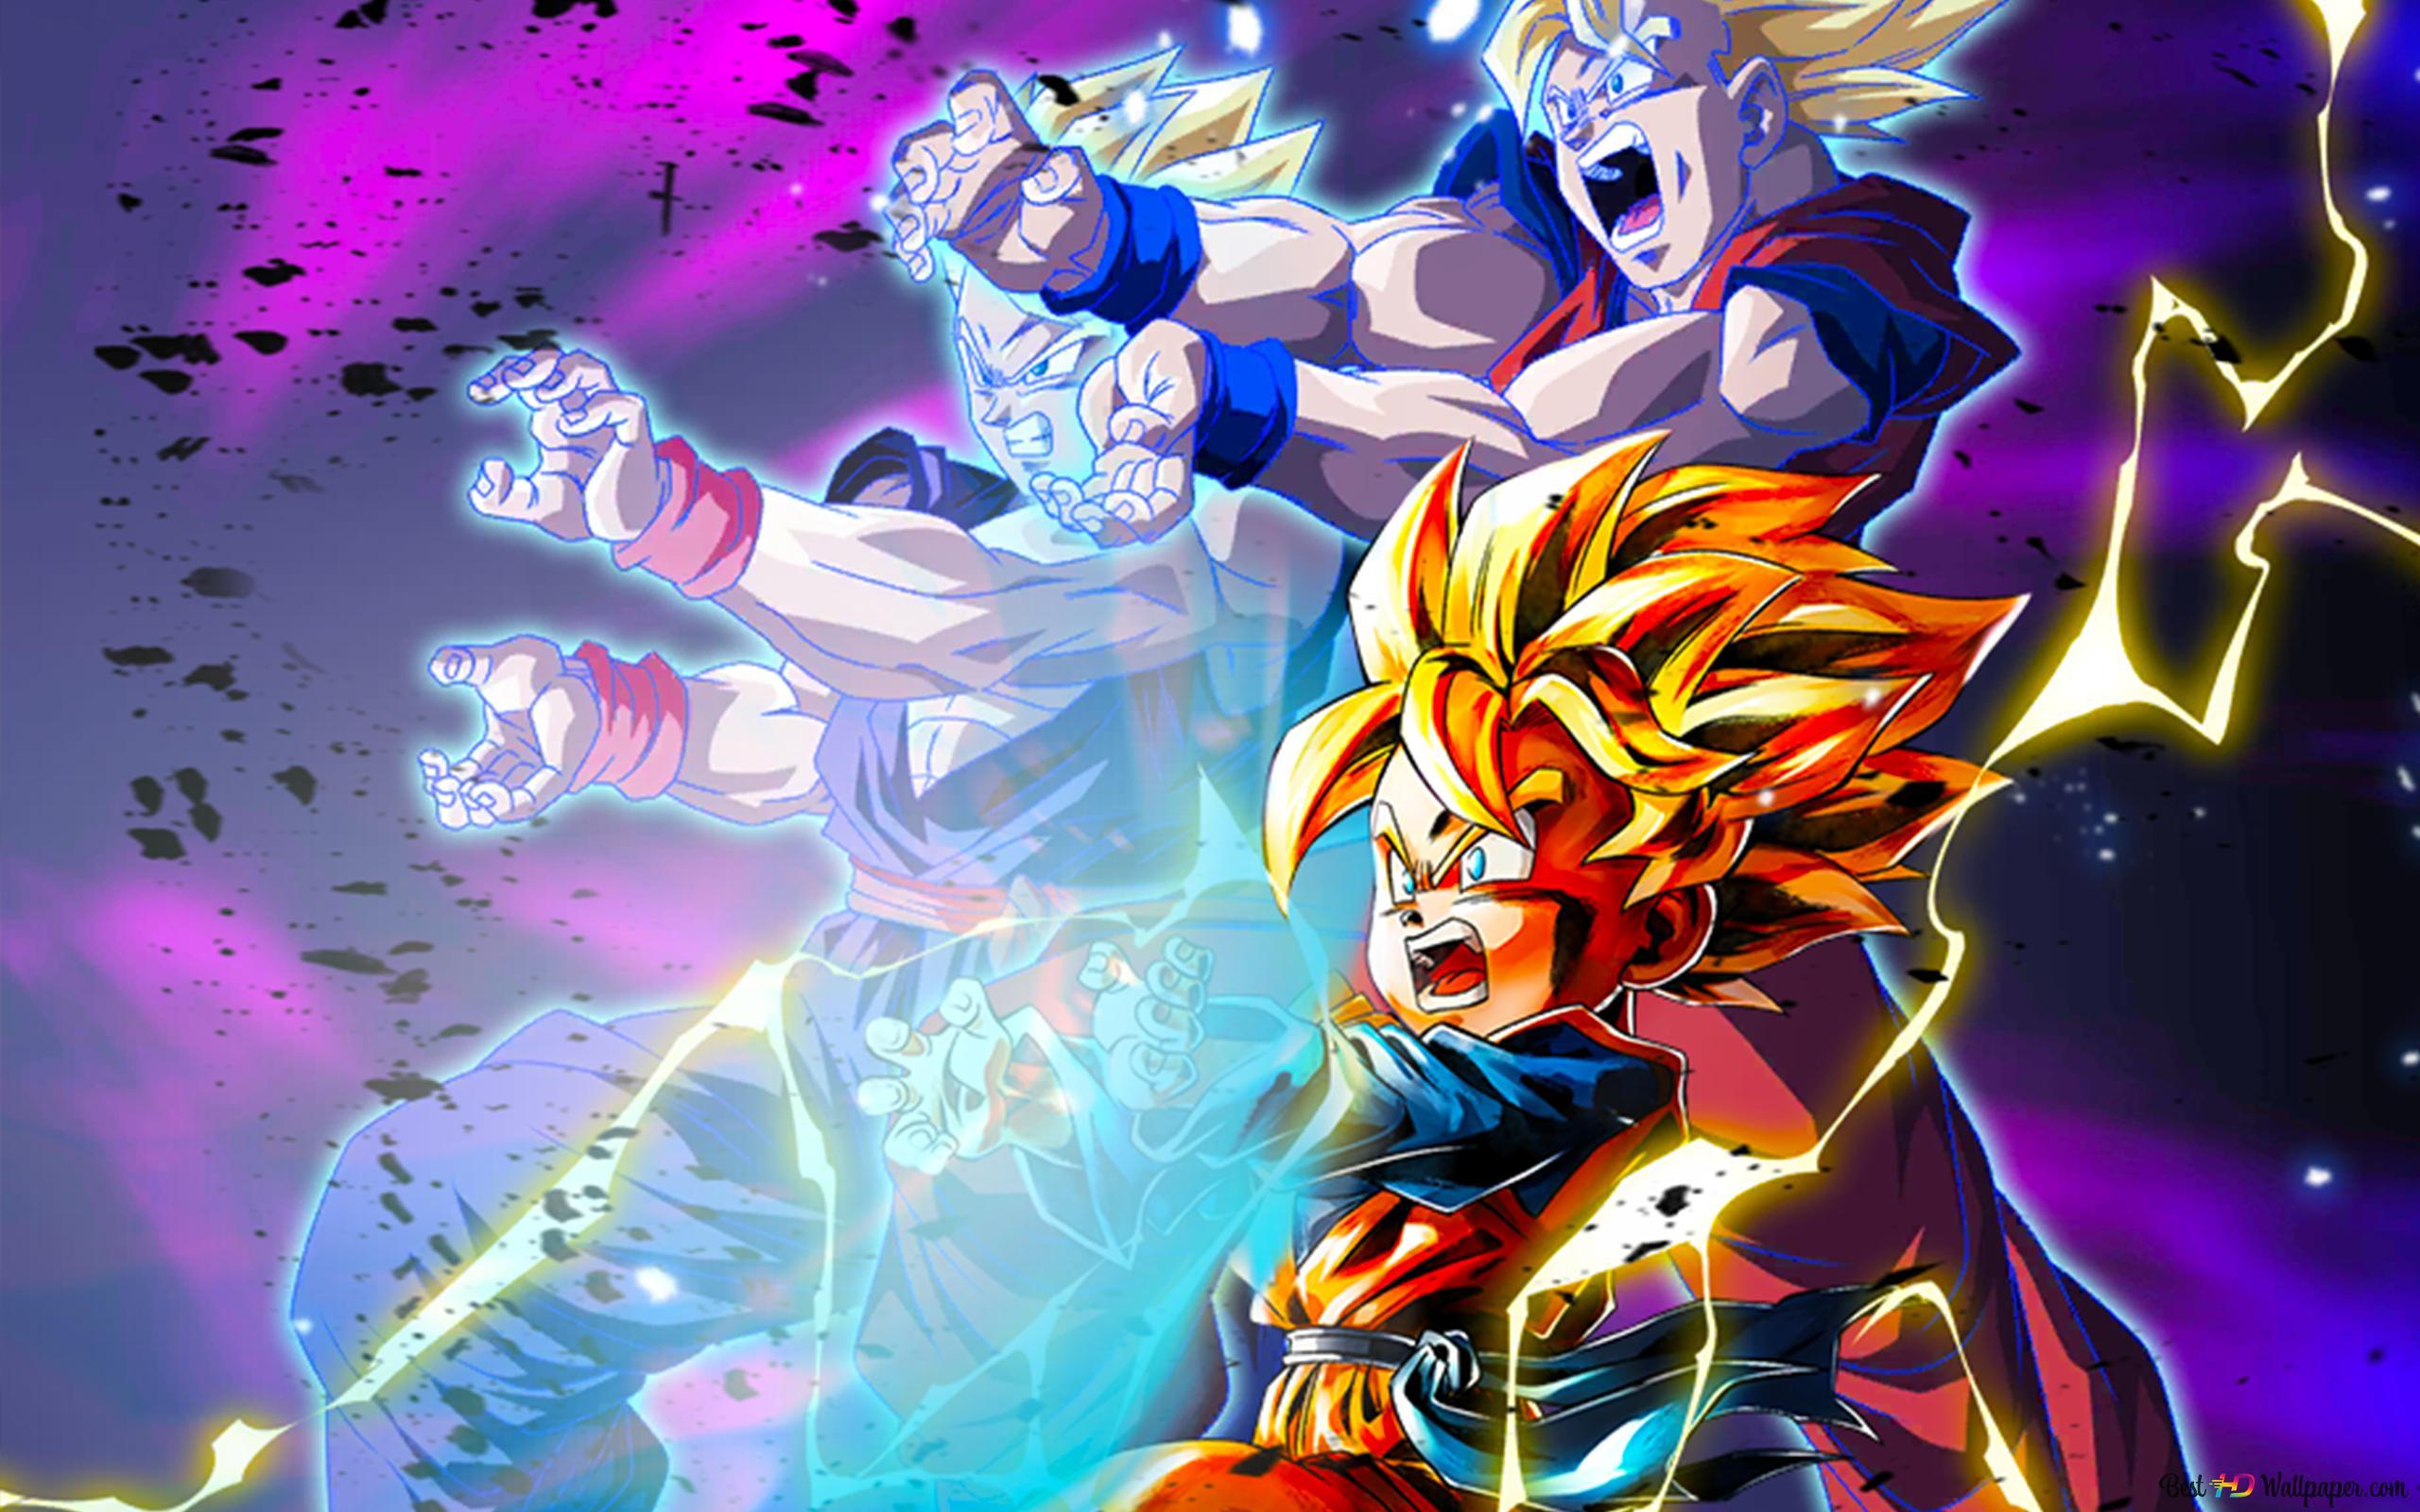 Super Saiyan Goten Dari Dragon Ball Z Dragon Ball Legends Arts Untuk Desktop Unduhan Wallpaper Hd